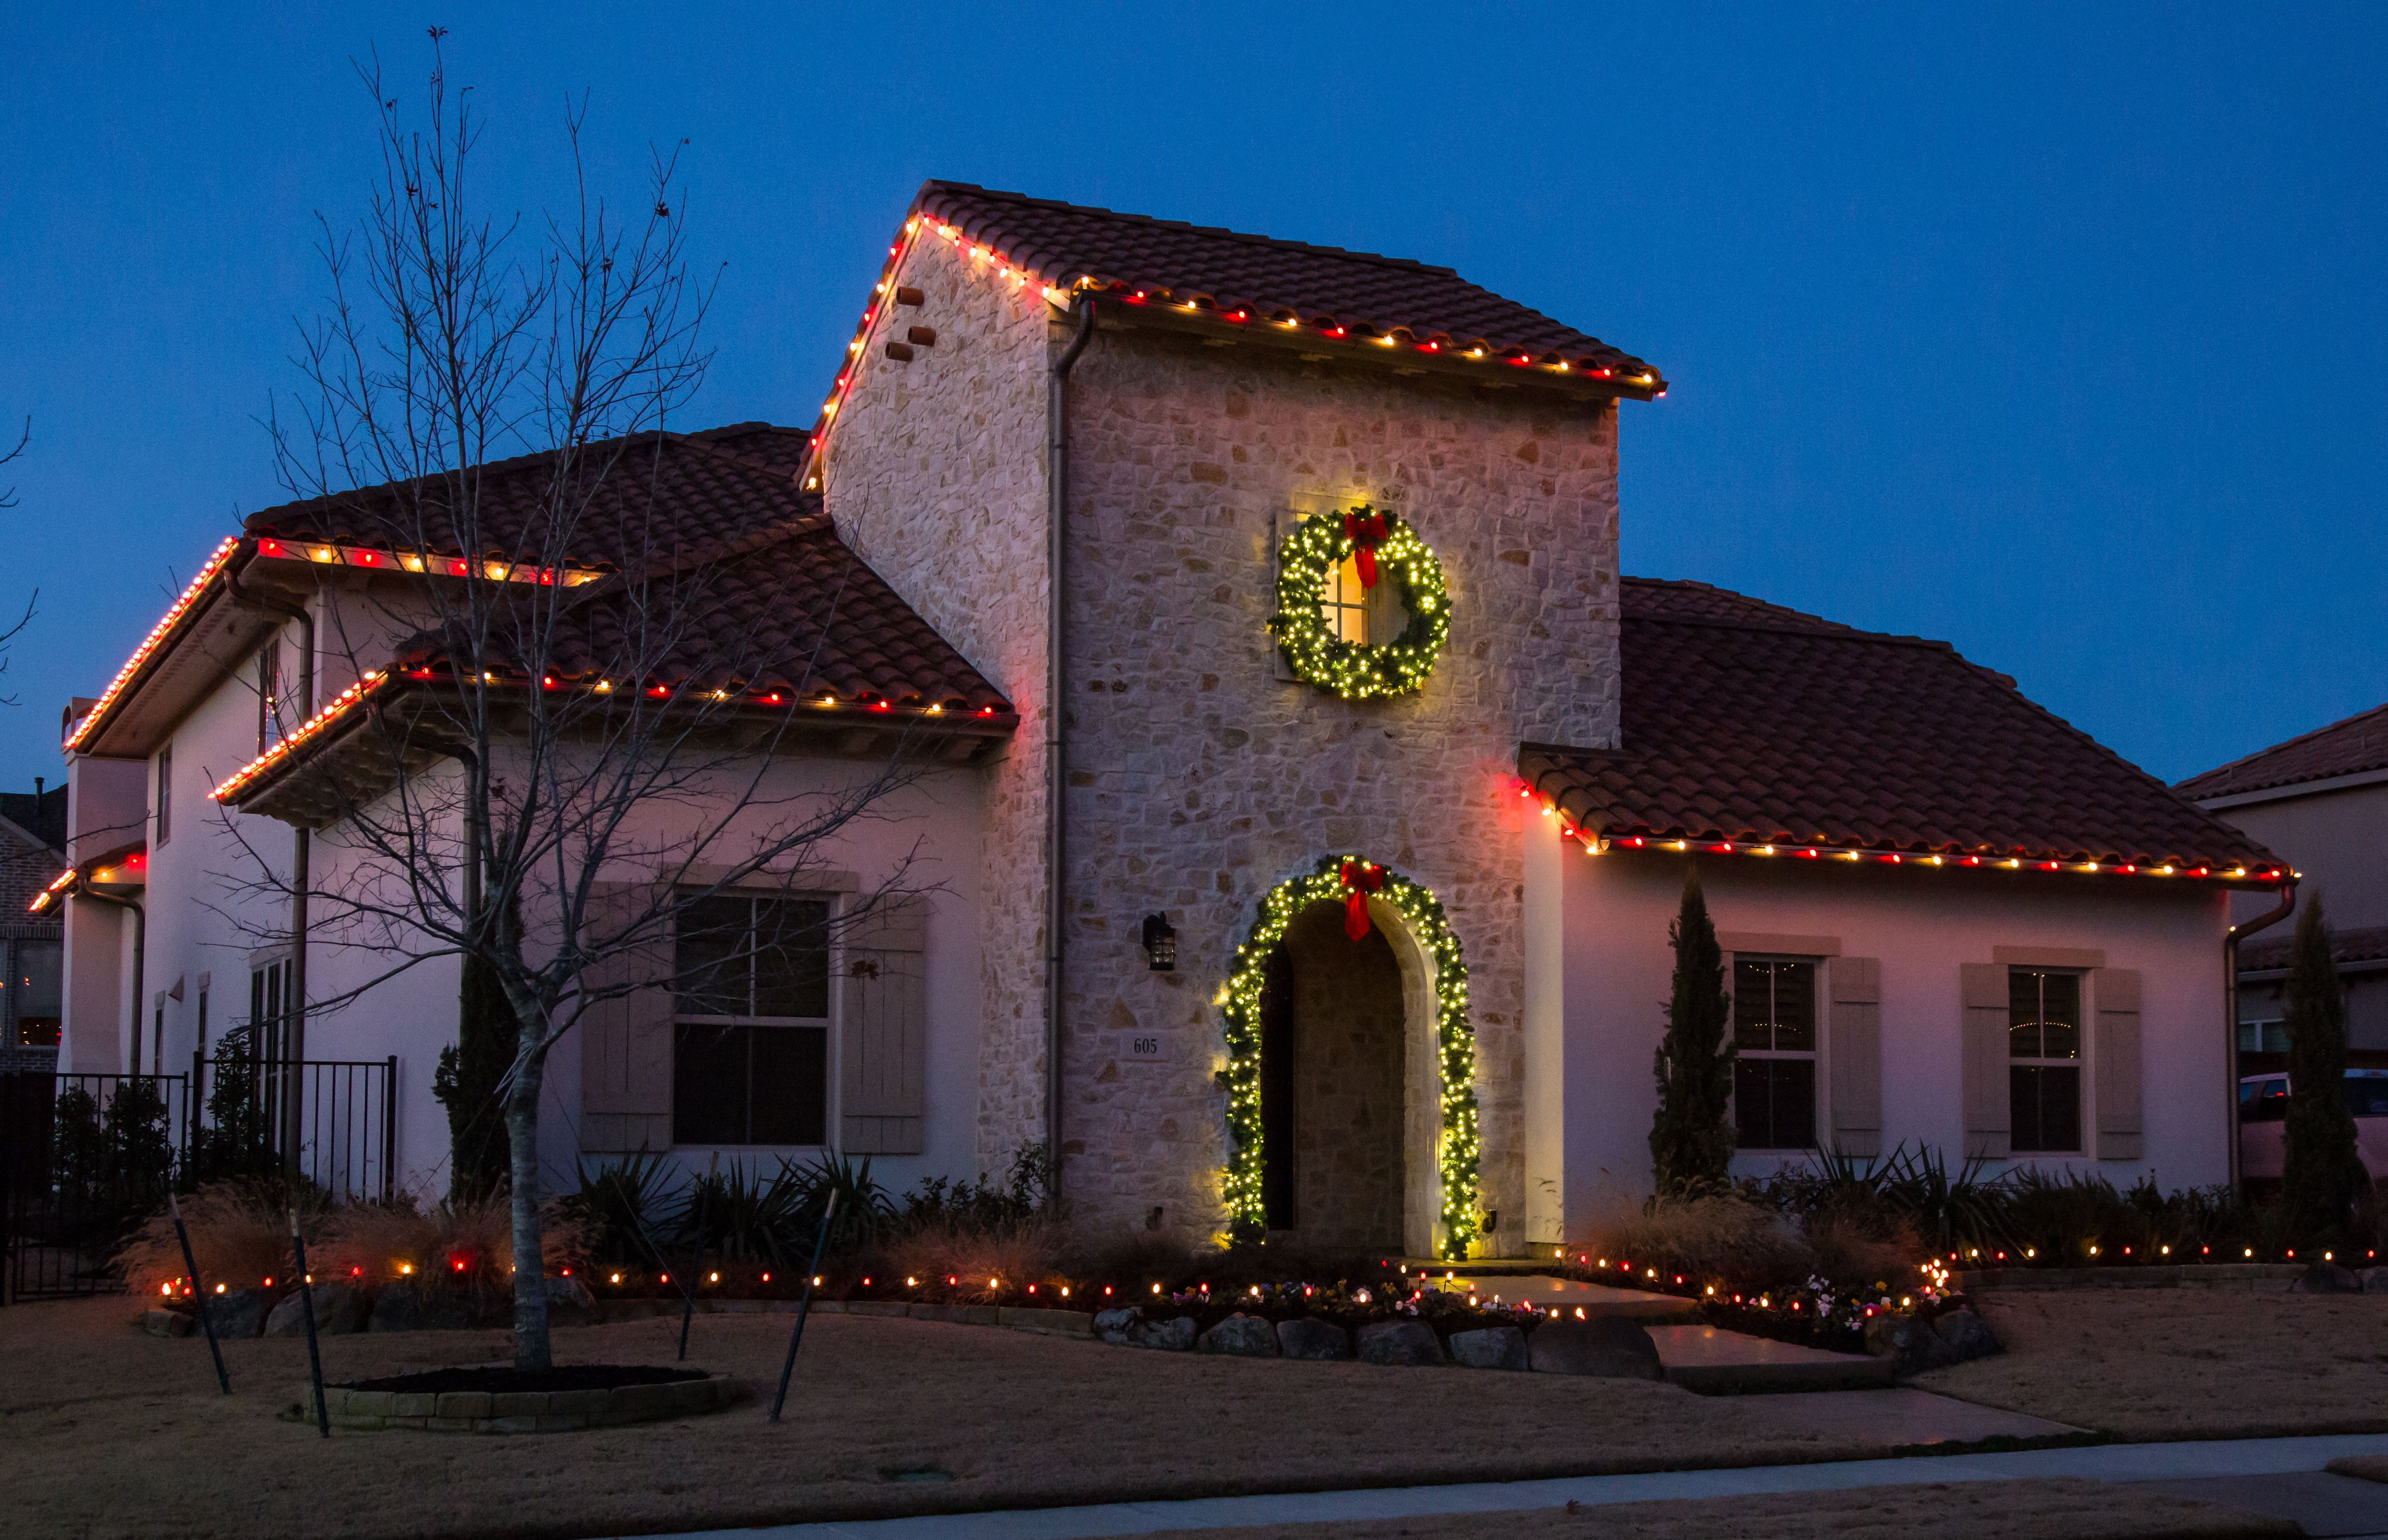 Simple, but not simplistic, Christmas Lighting ...